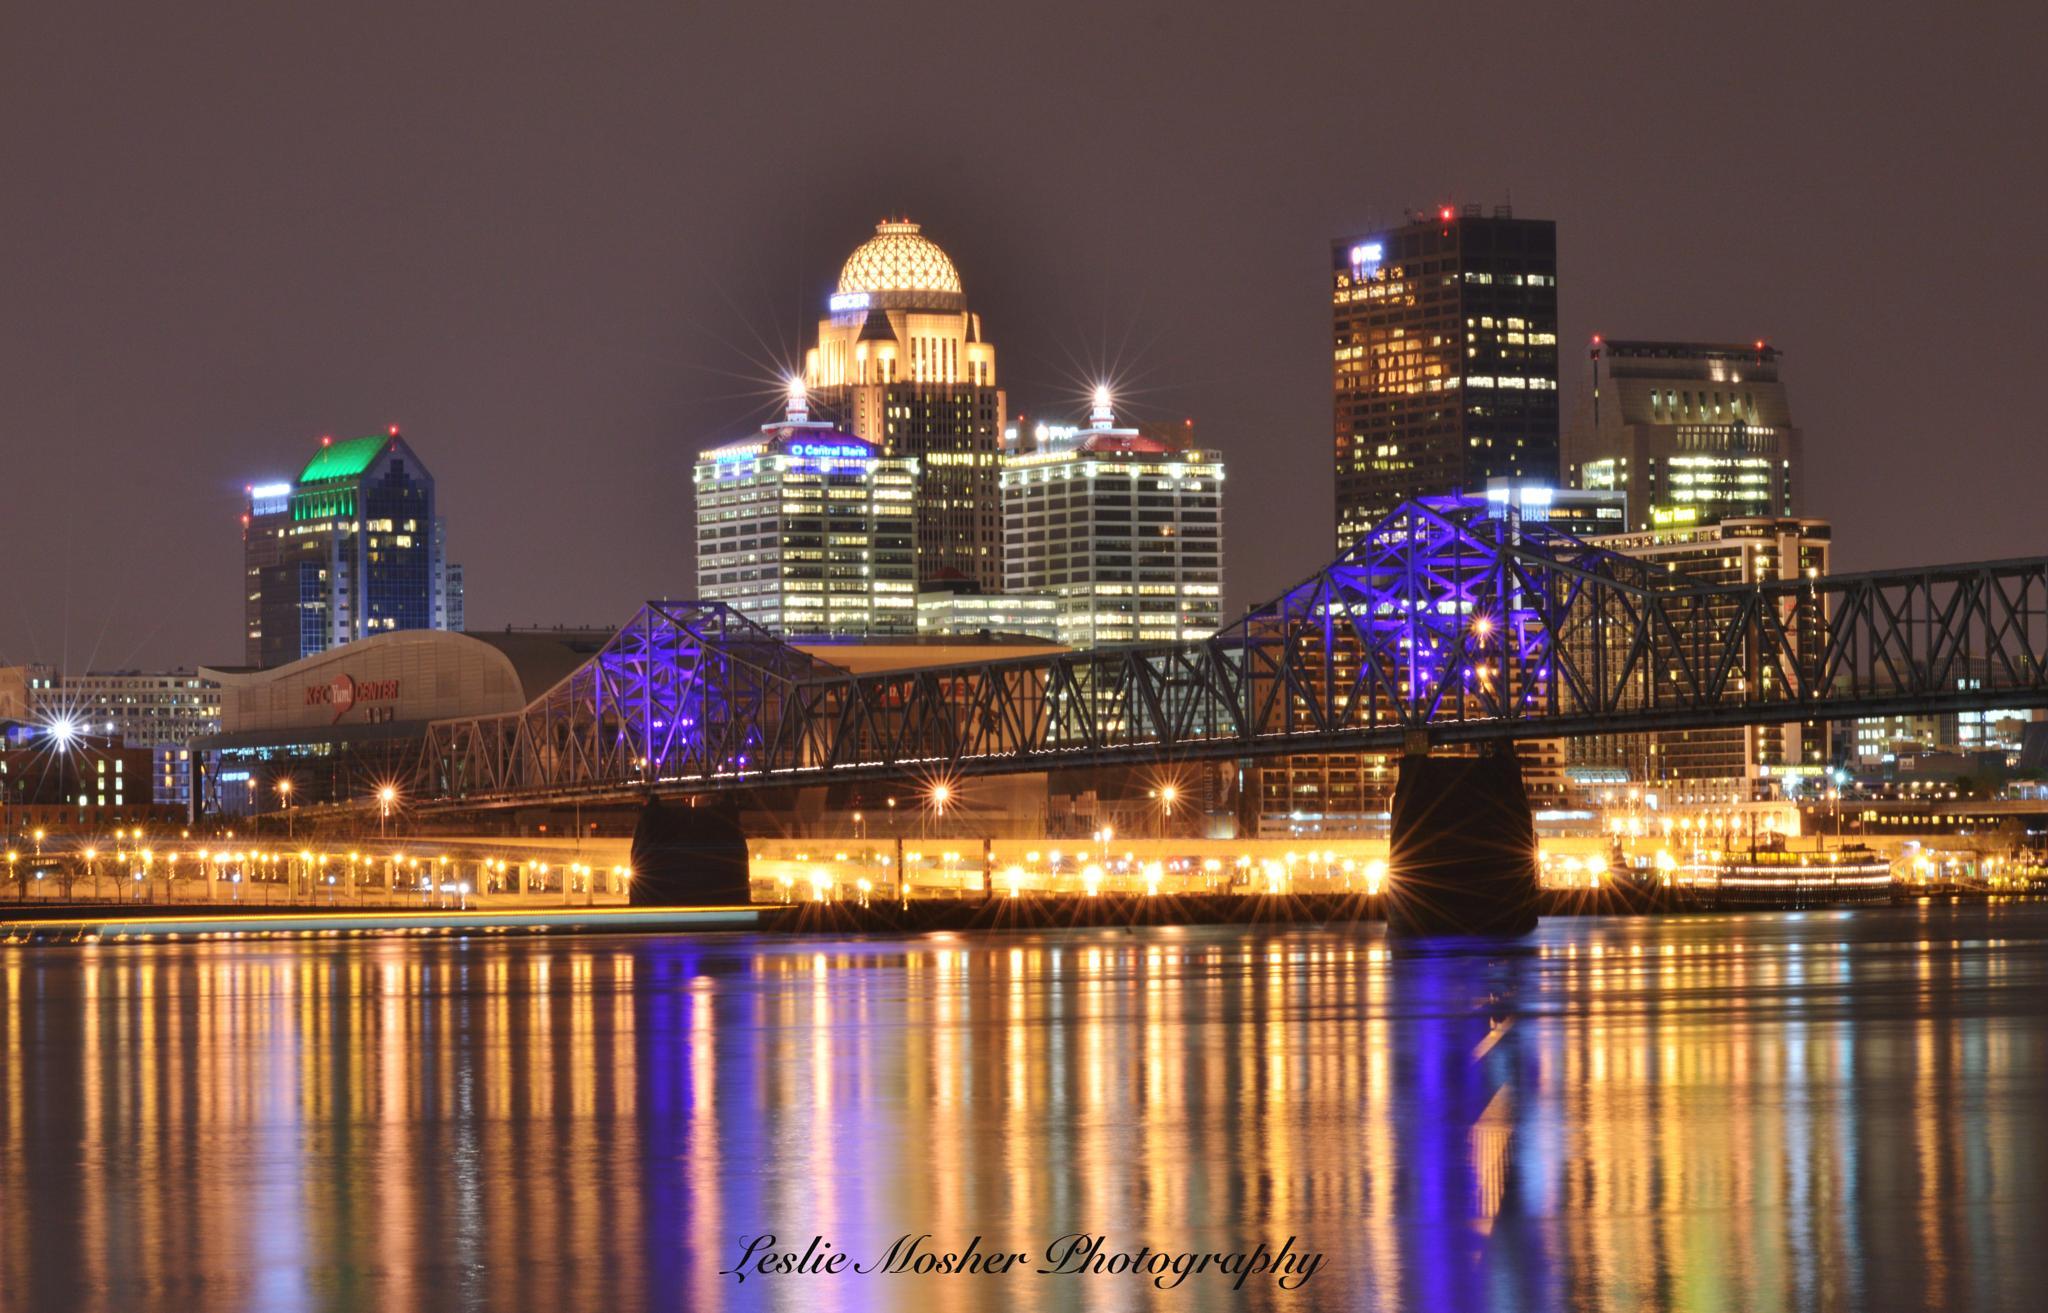 Louisville Ky night skyline  by Leslie Mosher